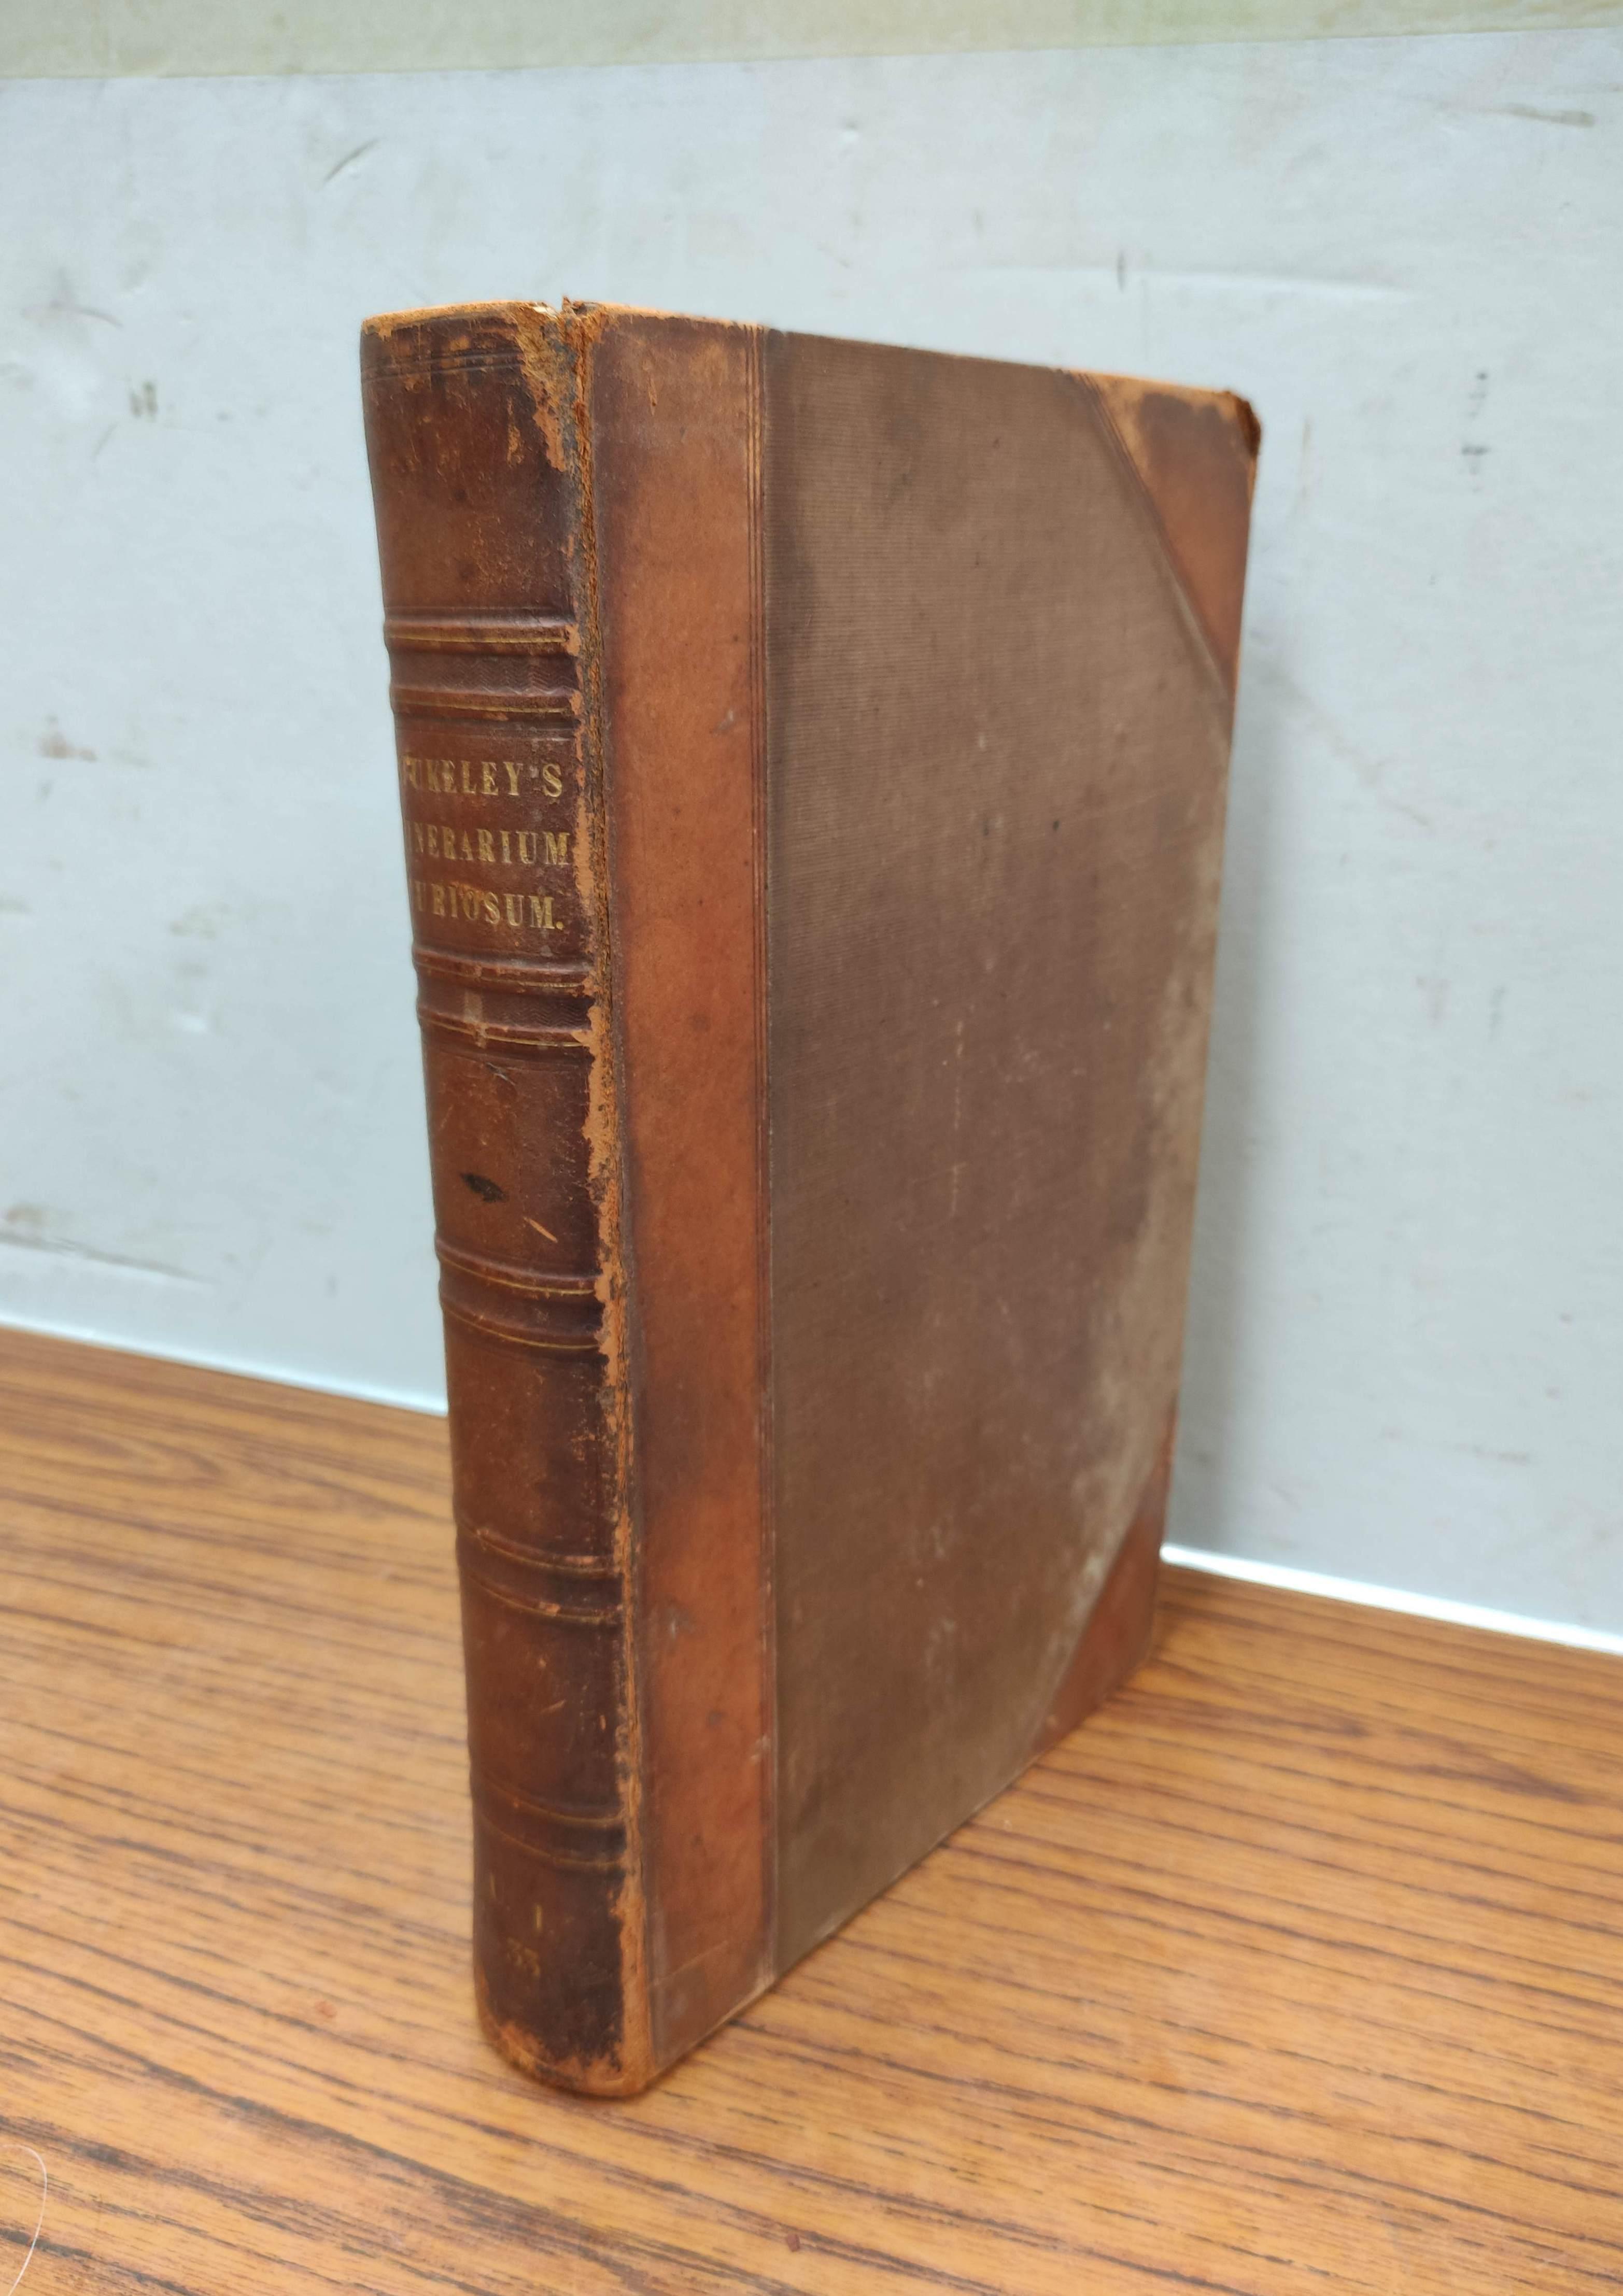 STUKELEY WILLIAM.Itinerarium Curiosum or An Account of the Antiquities & Remarkable Curiousities